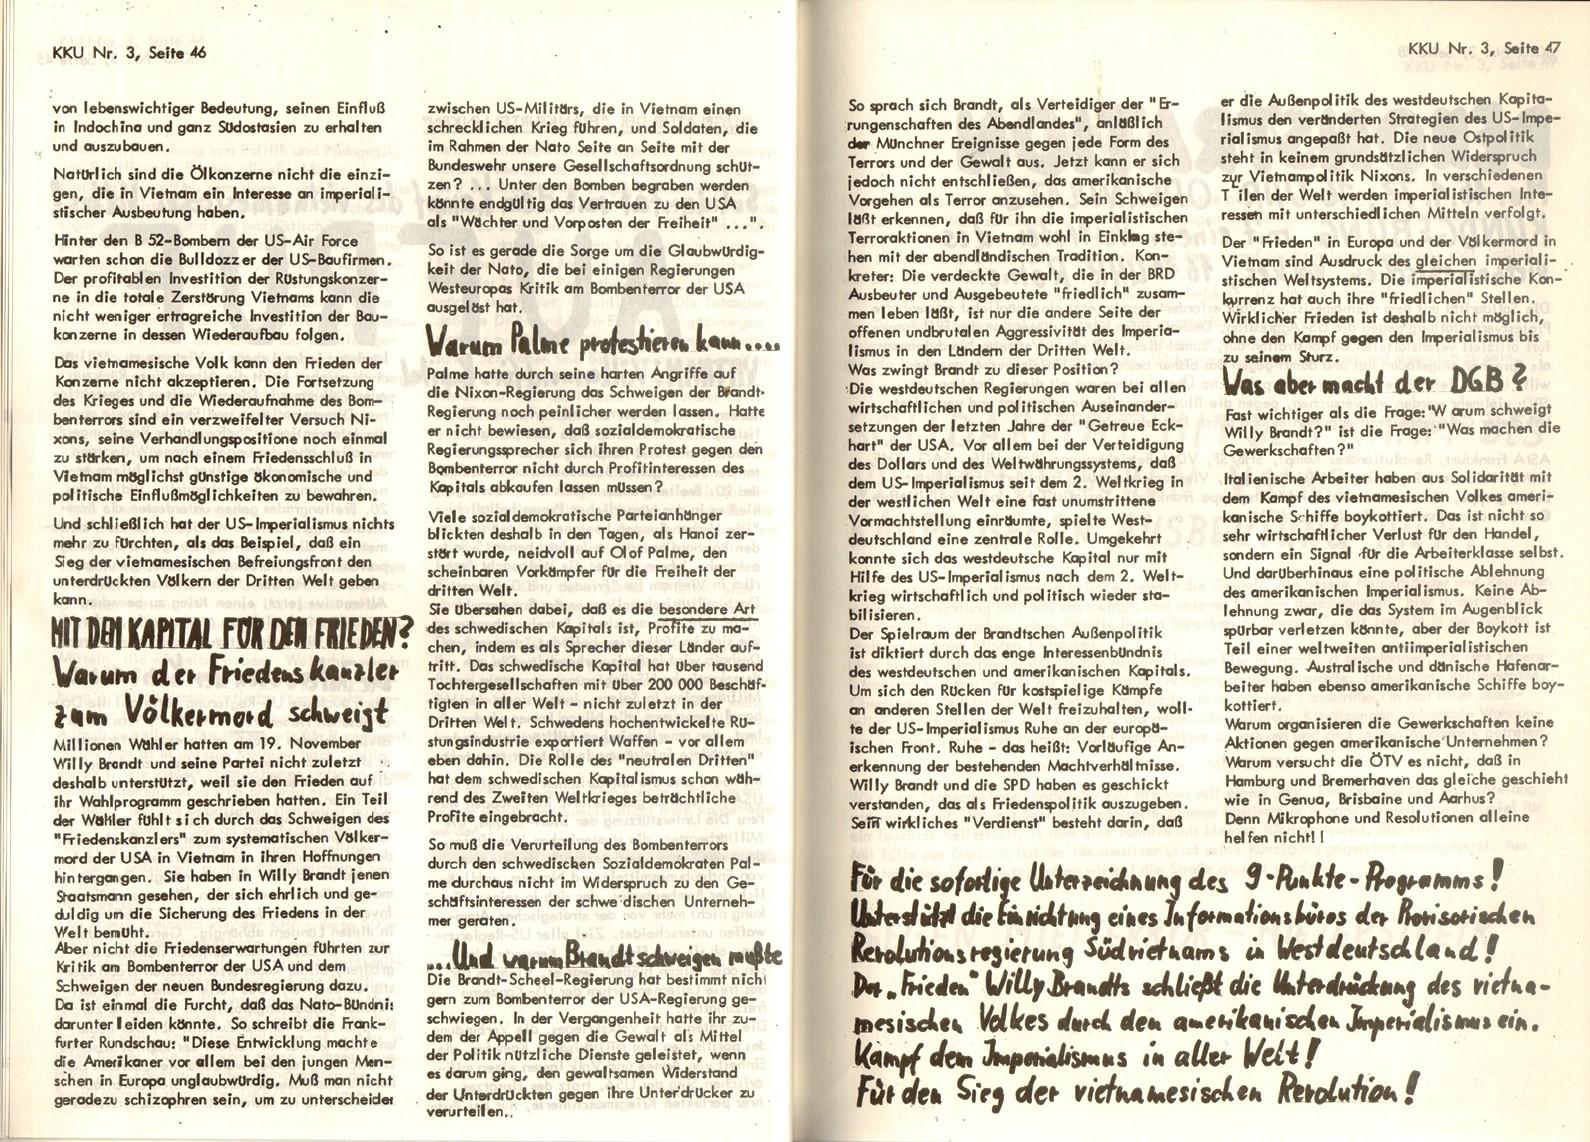 Frankfurt_Offenbach_KG_Kampf_Kritik_Umgestaltung_1973_03_25